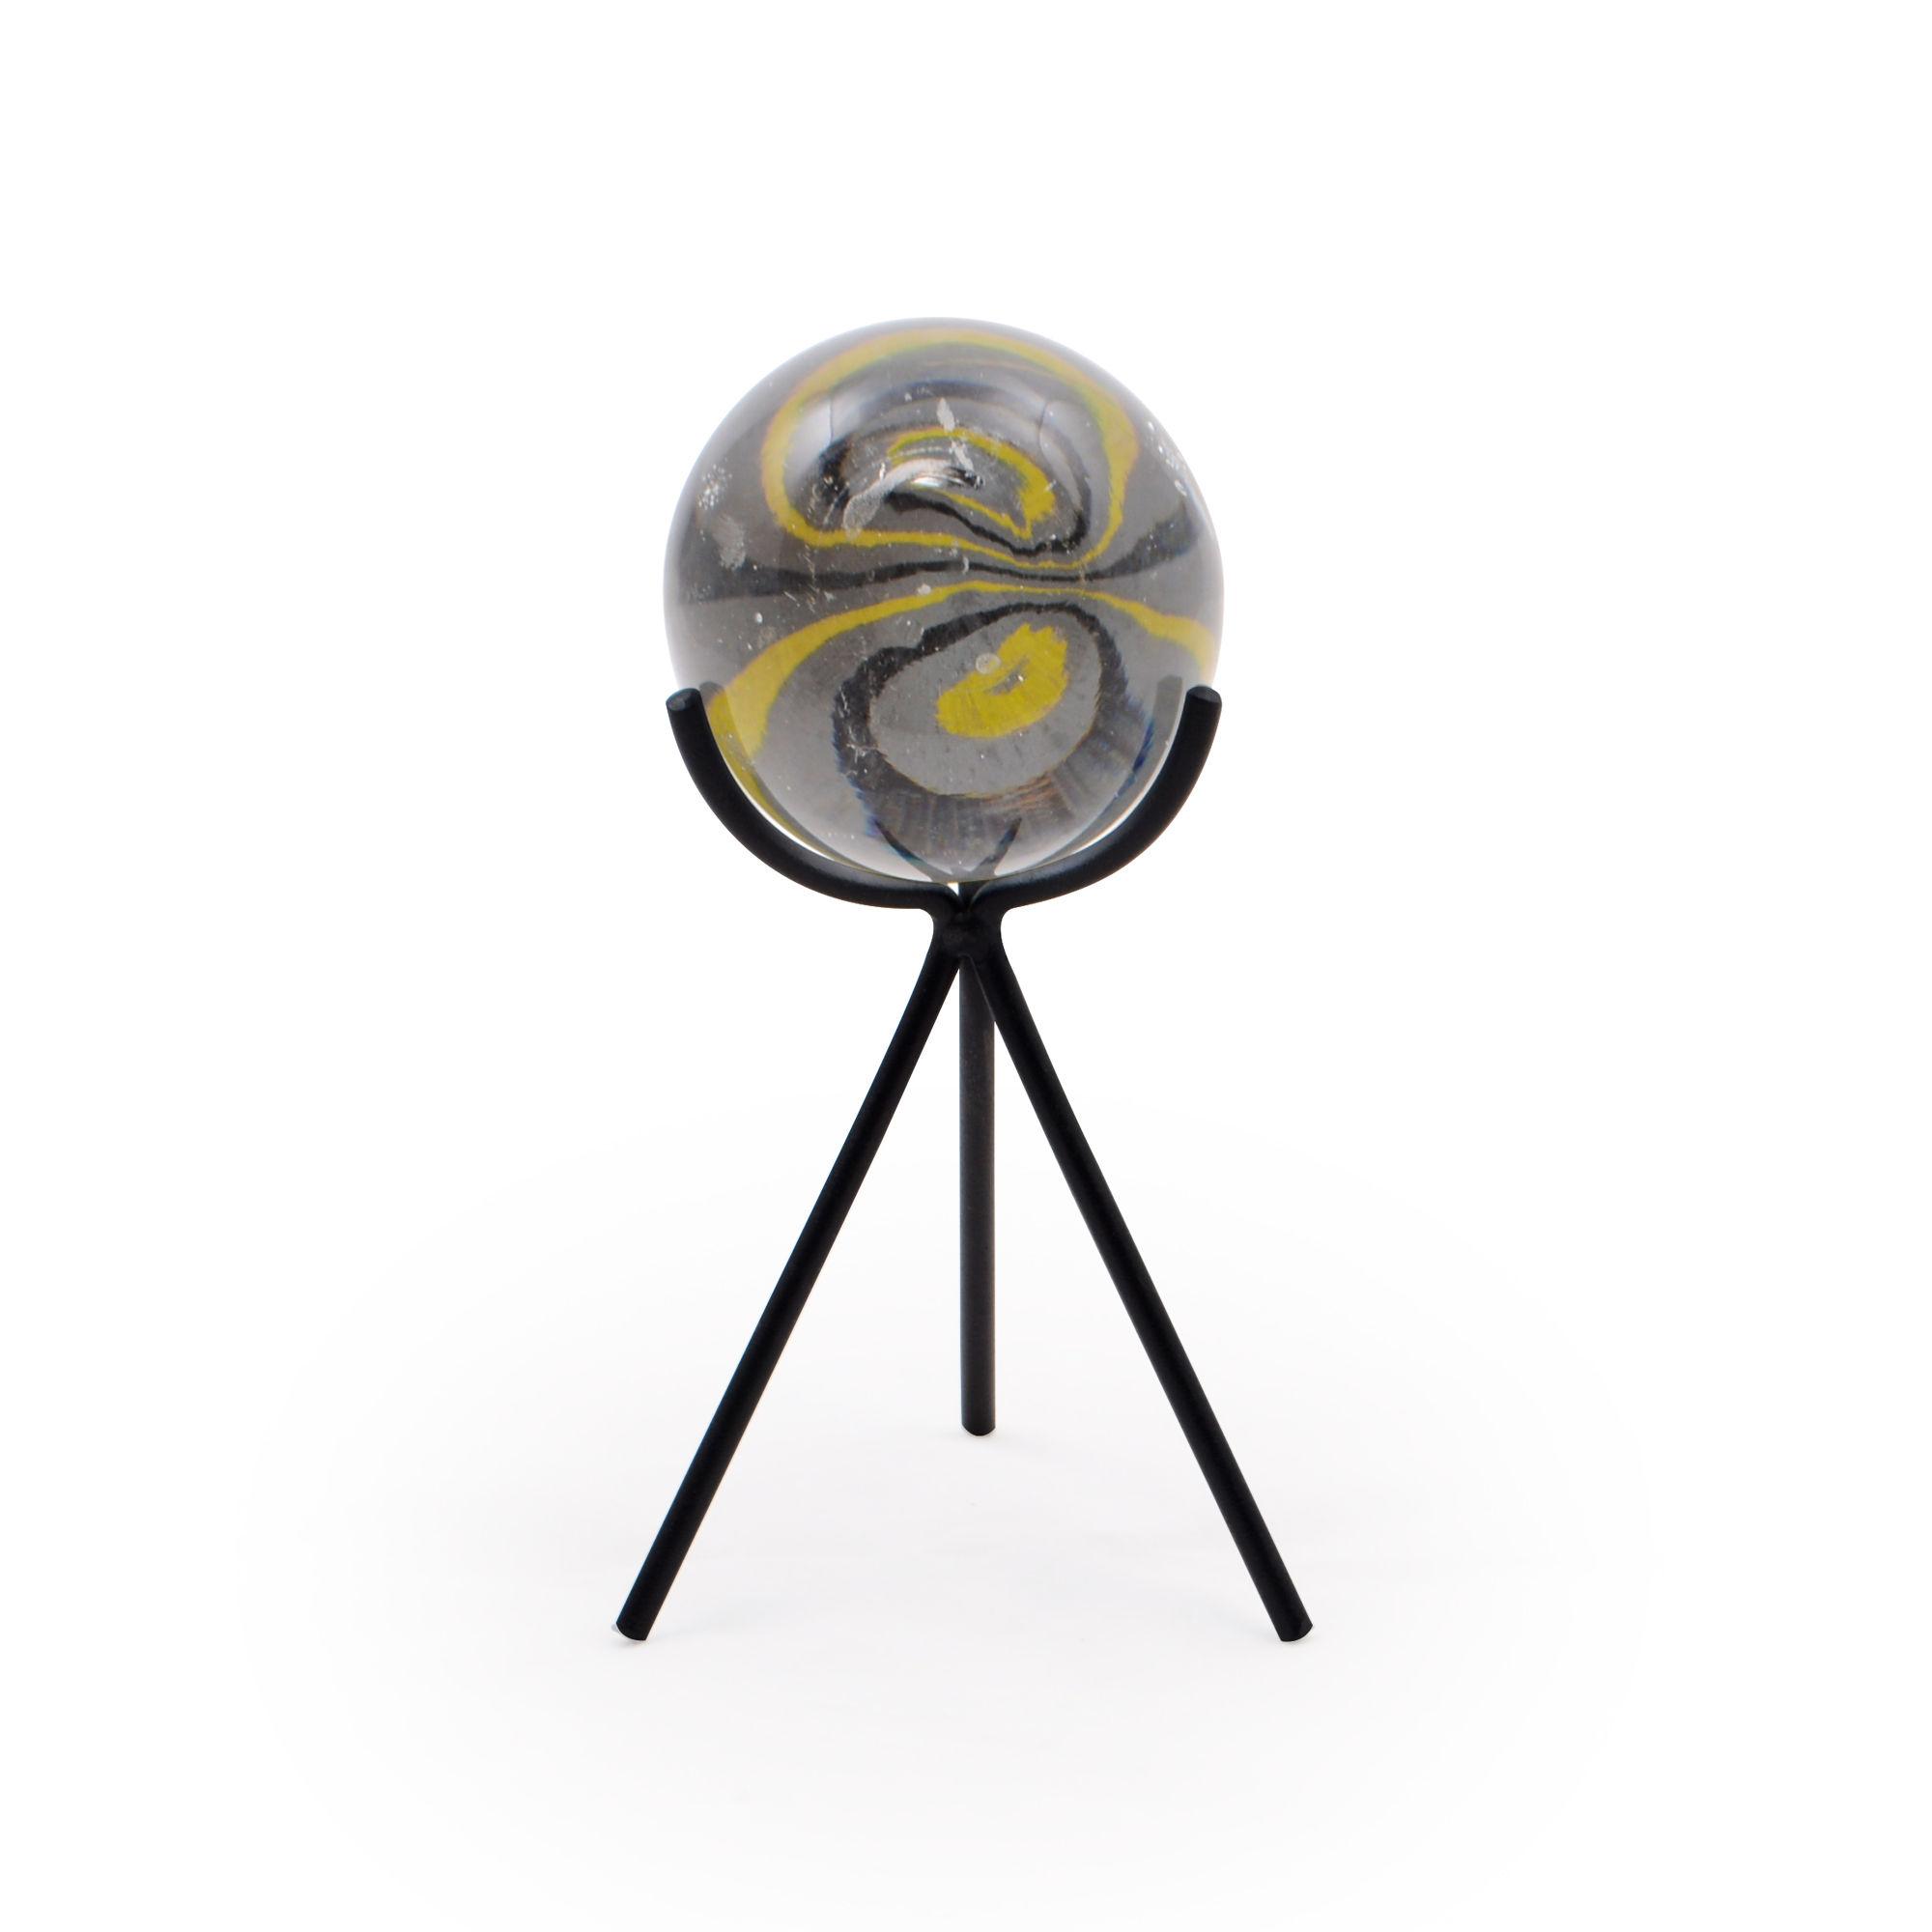 Escultura de ferro com esfera